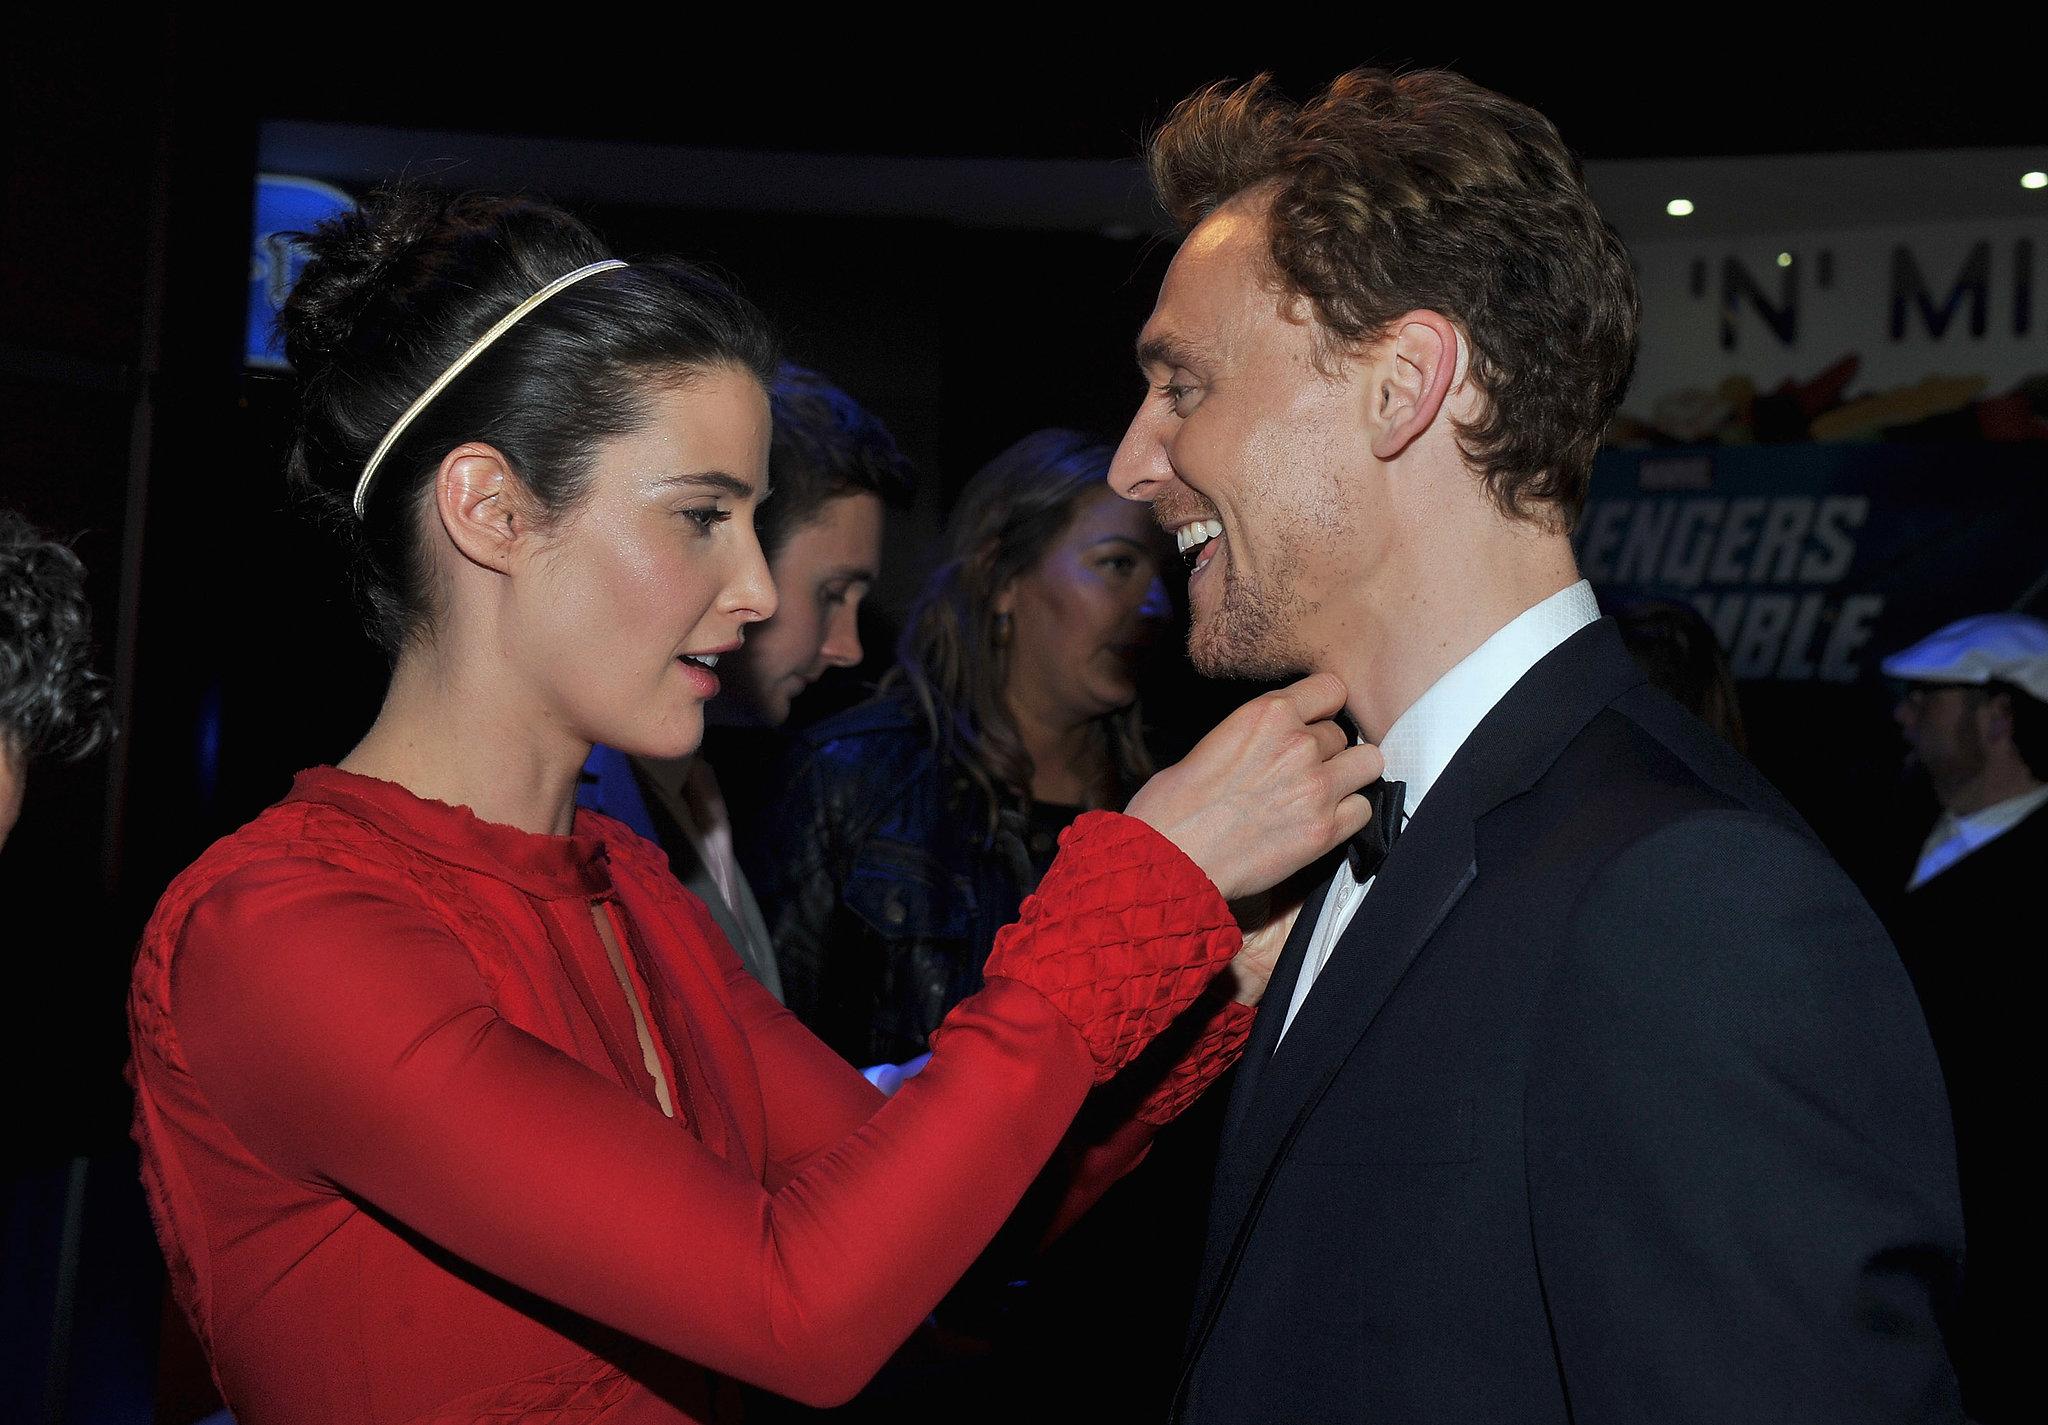 Cobie Smulders tom hiddleston